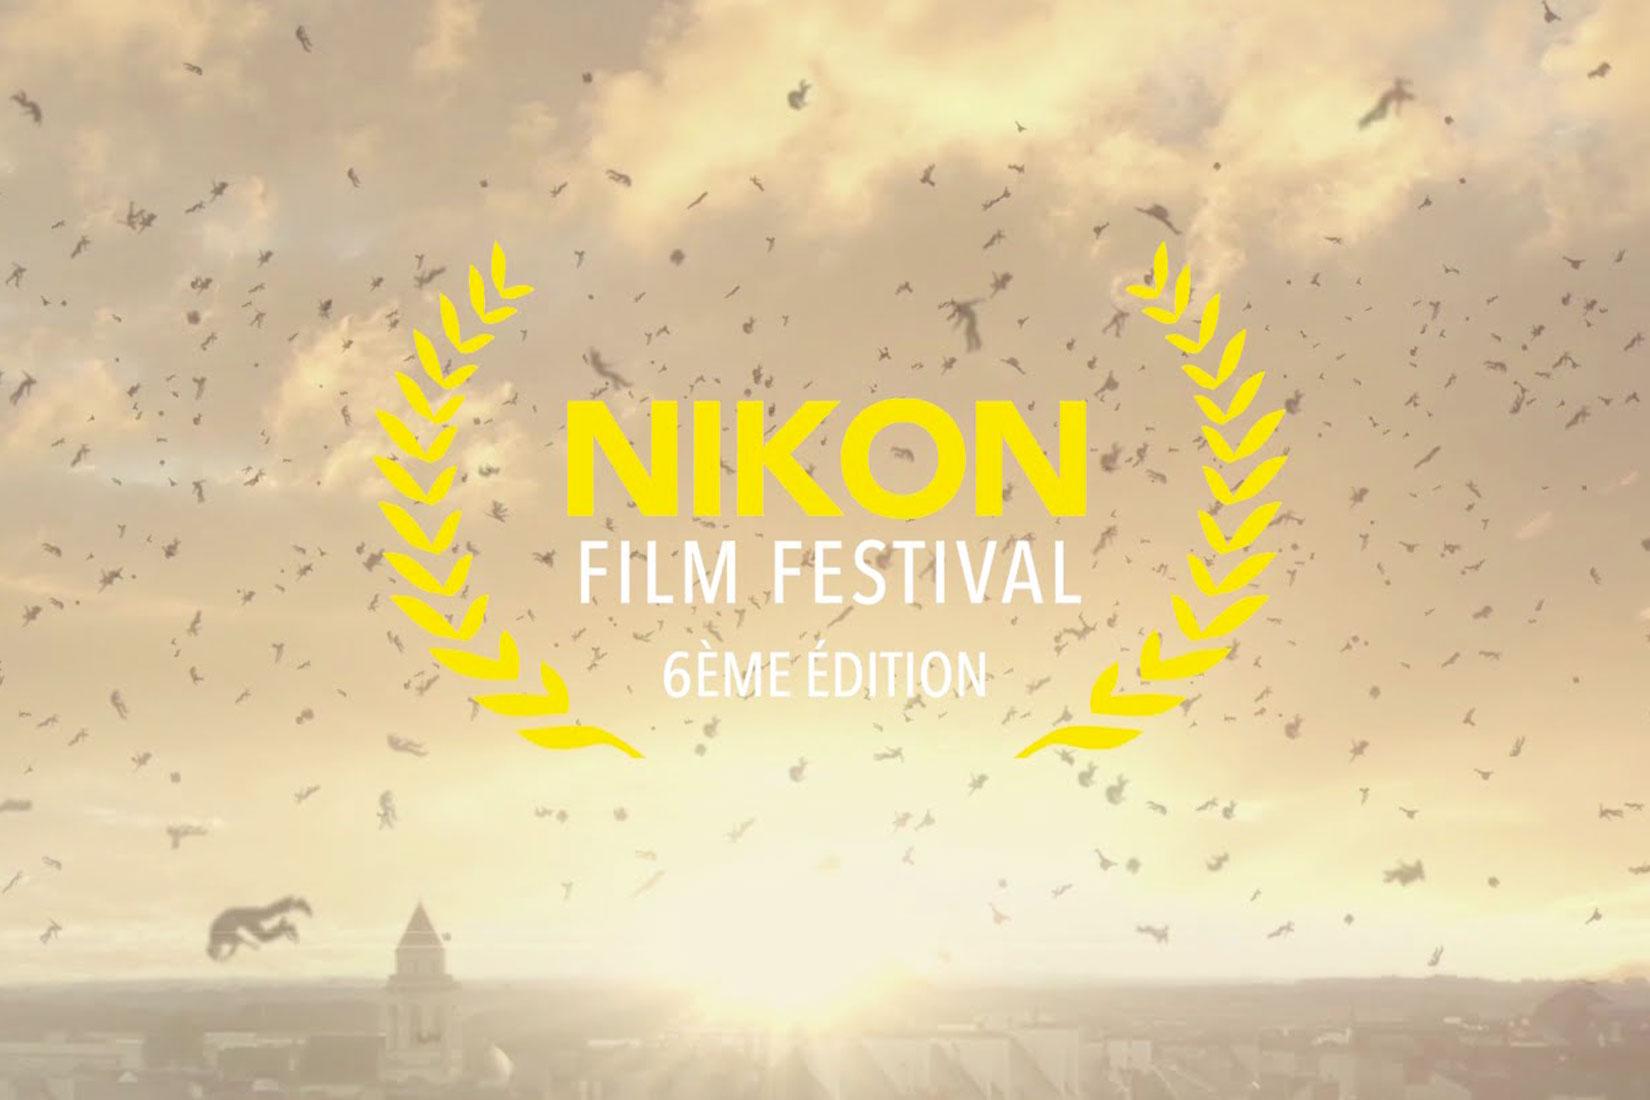 Nikon_Film_Festival_6eme_edition